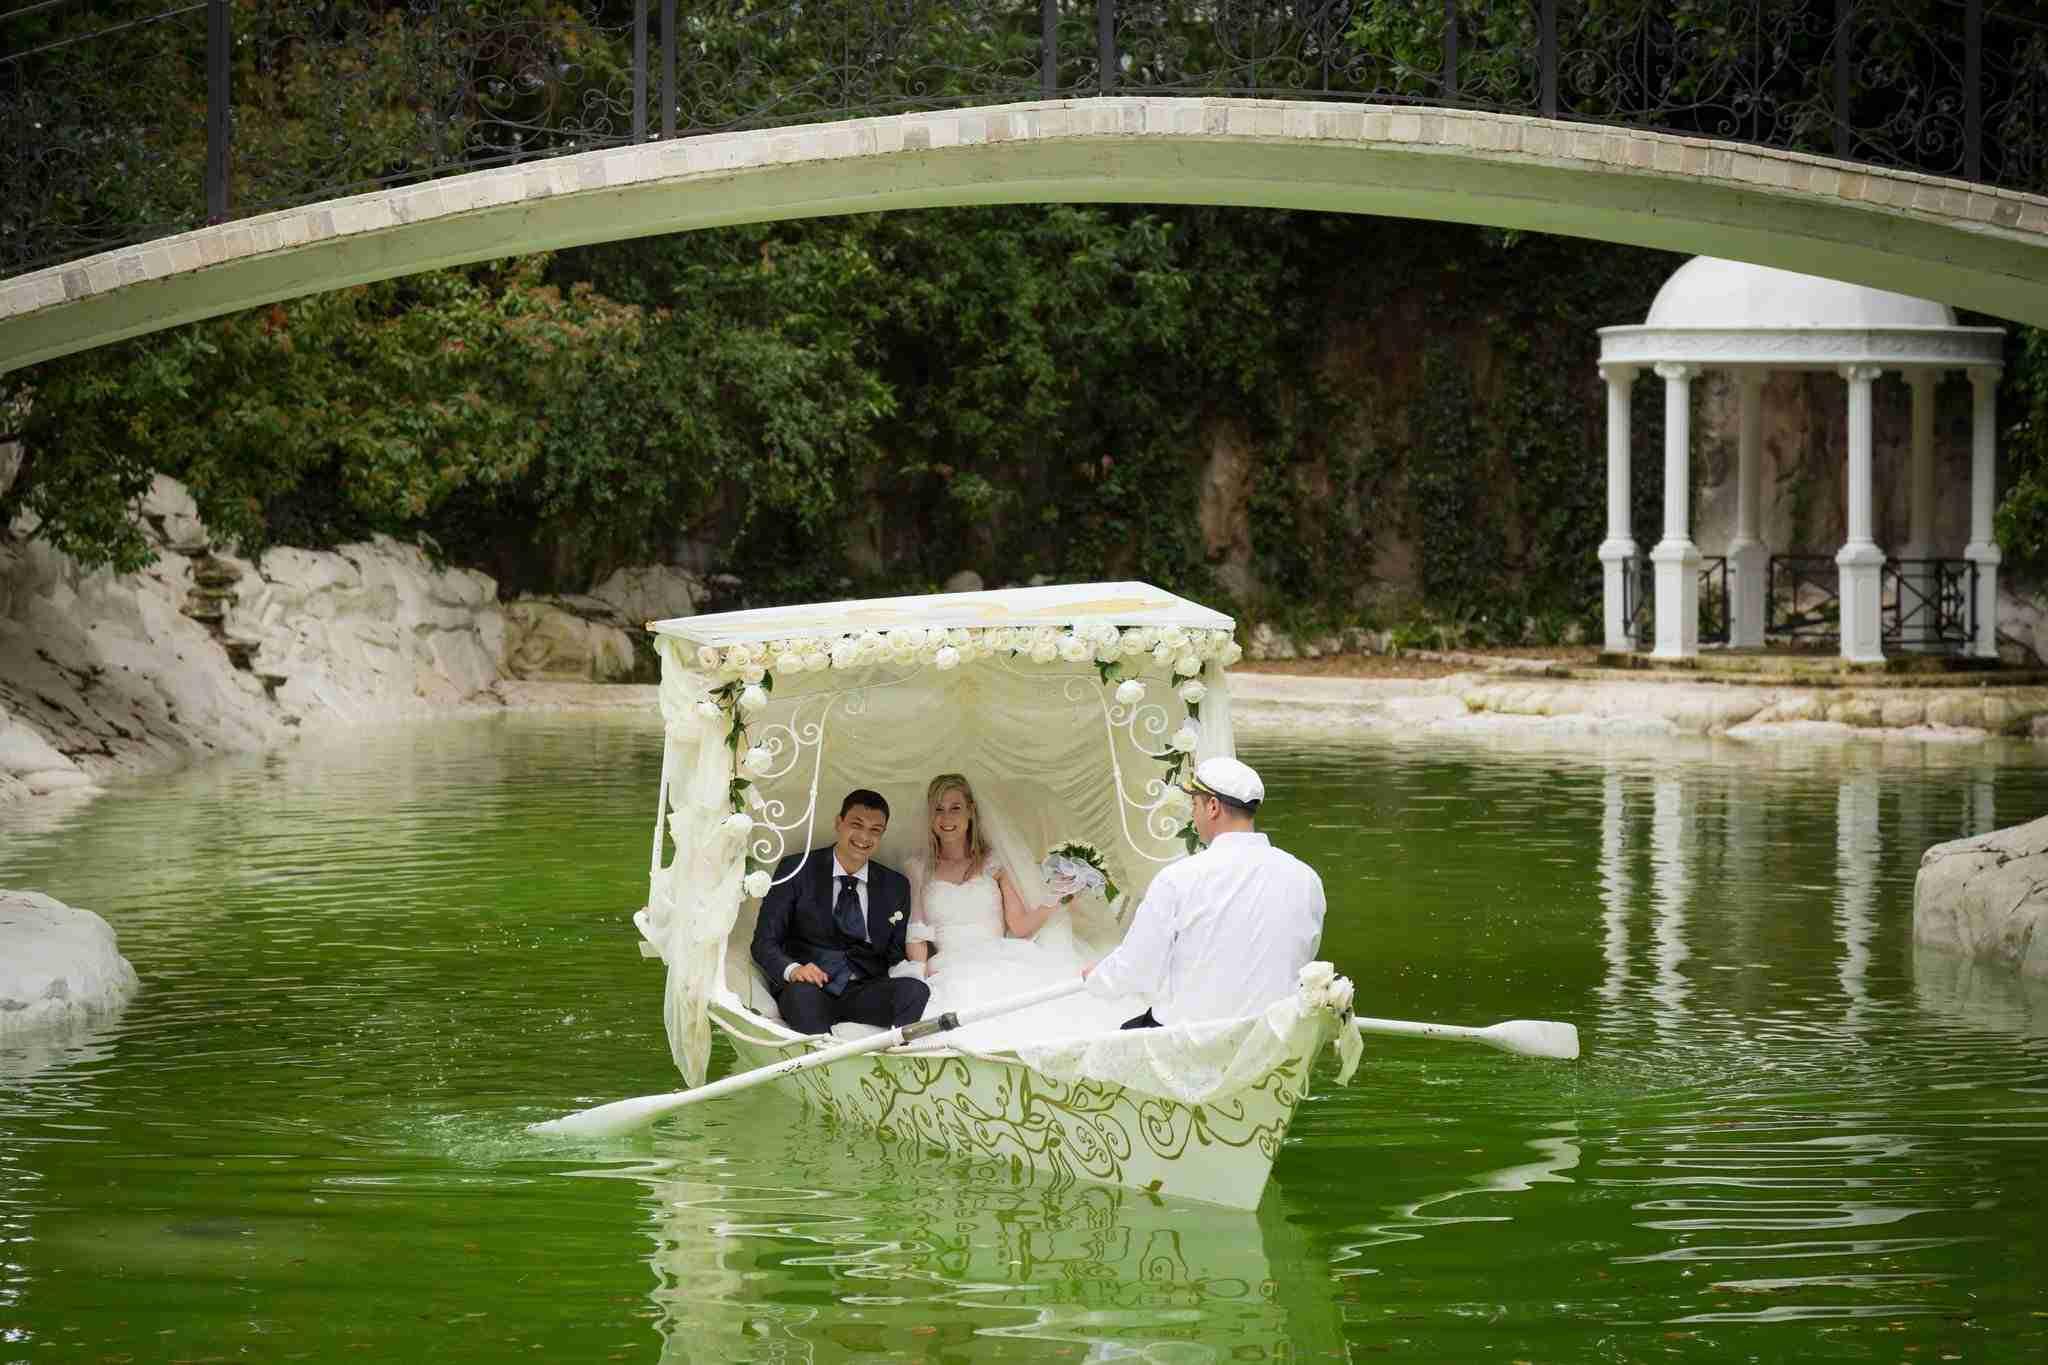 Matrimonio in Villa lago dei cigni: gondola, lago